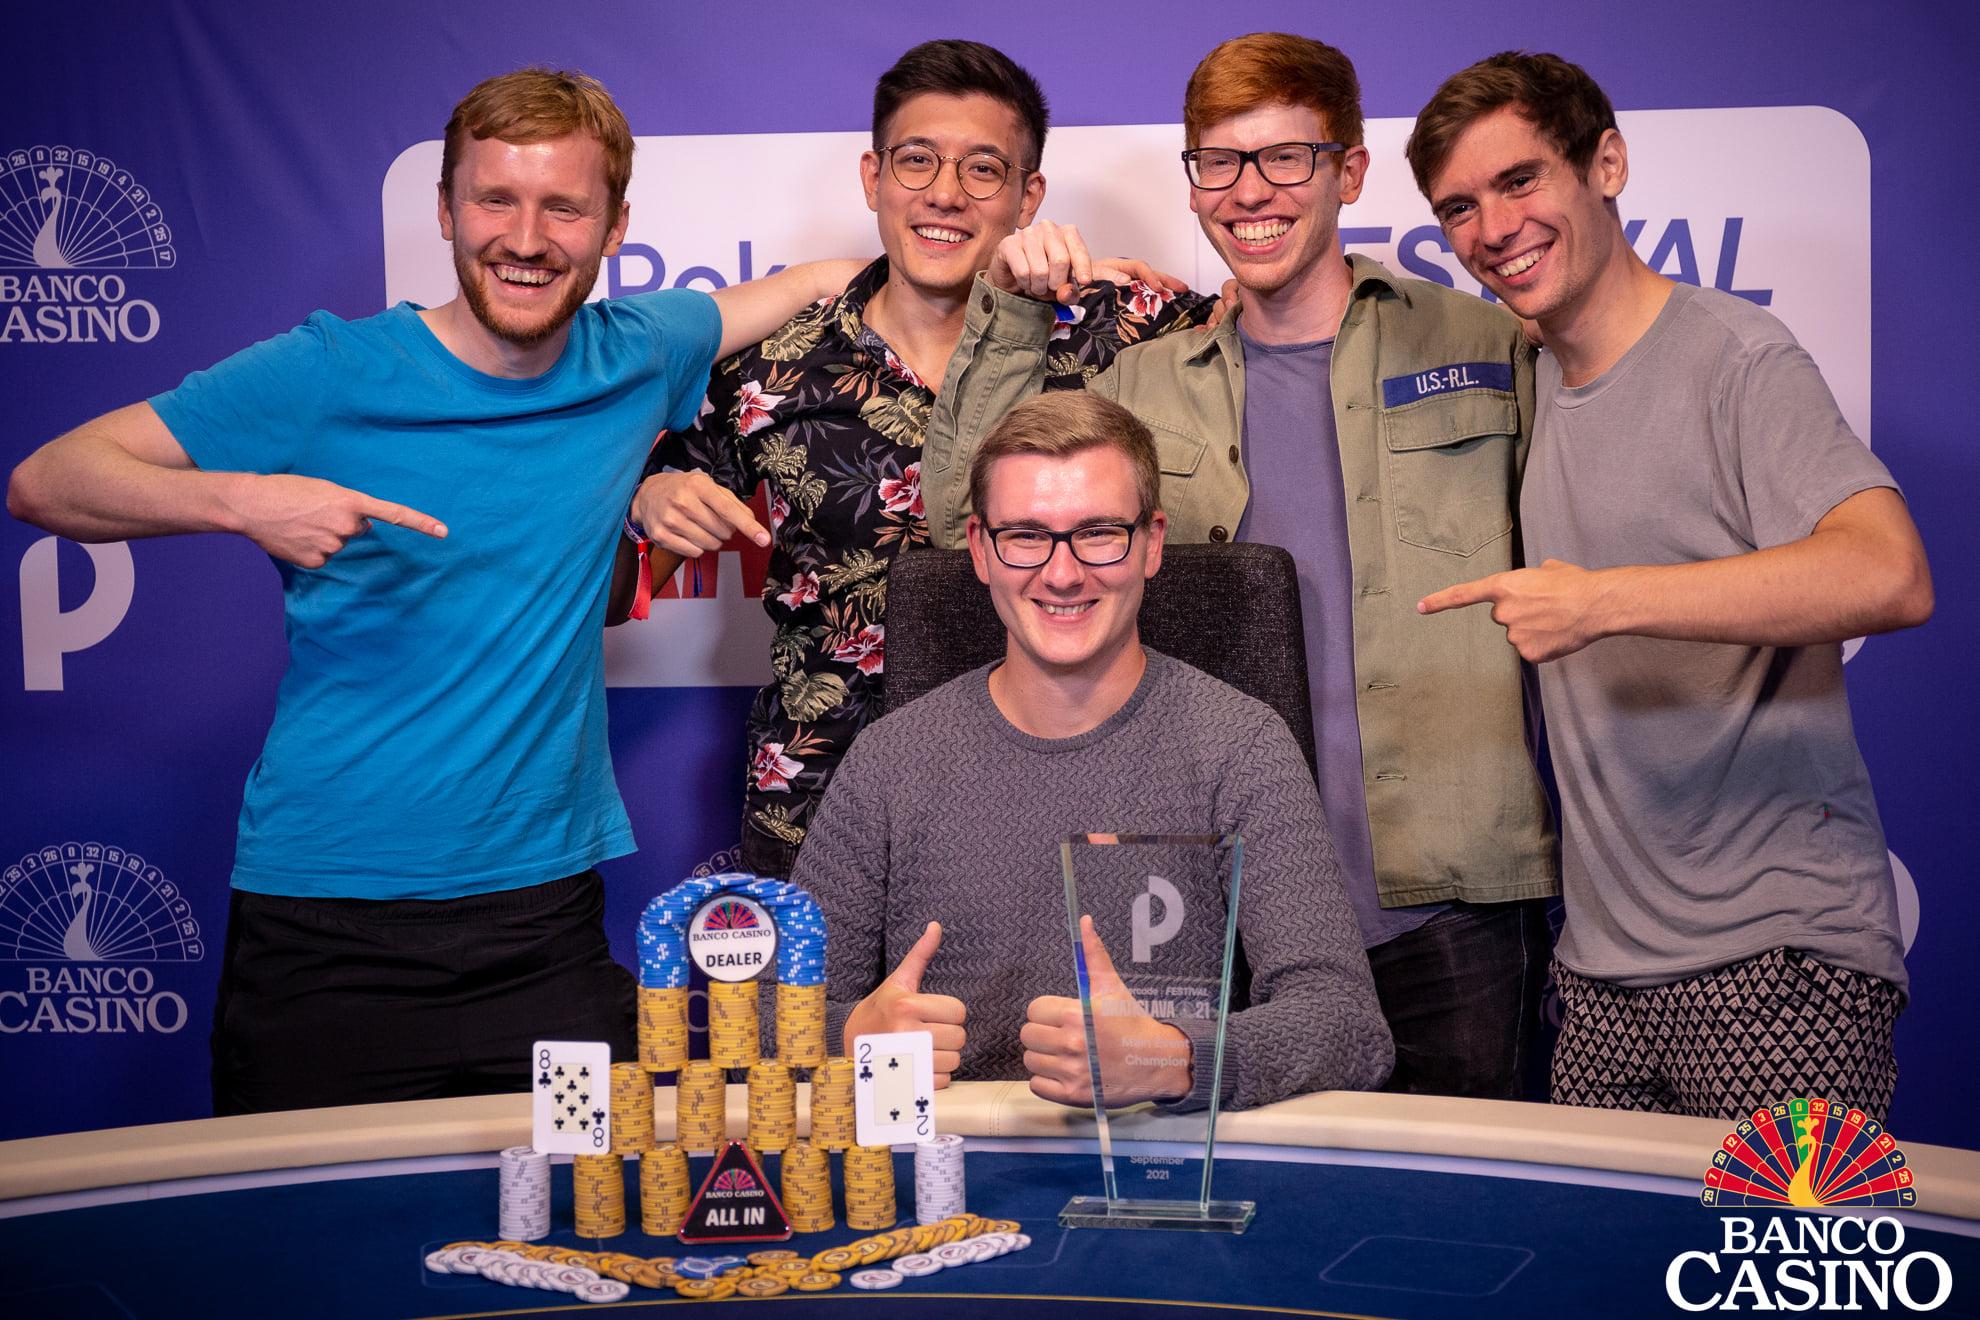 Pokercode Main Event korunoval nového šampióna Maxa Silz za 23,169€!